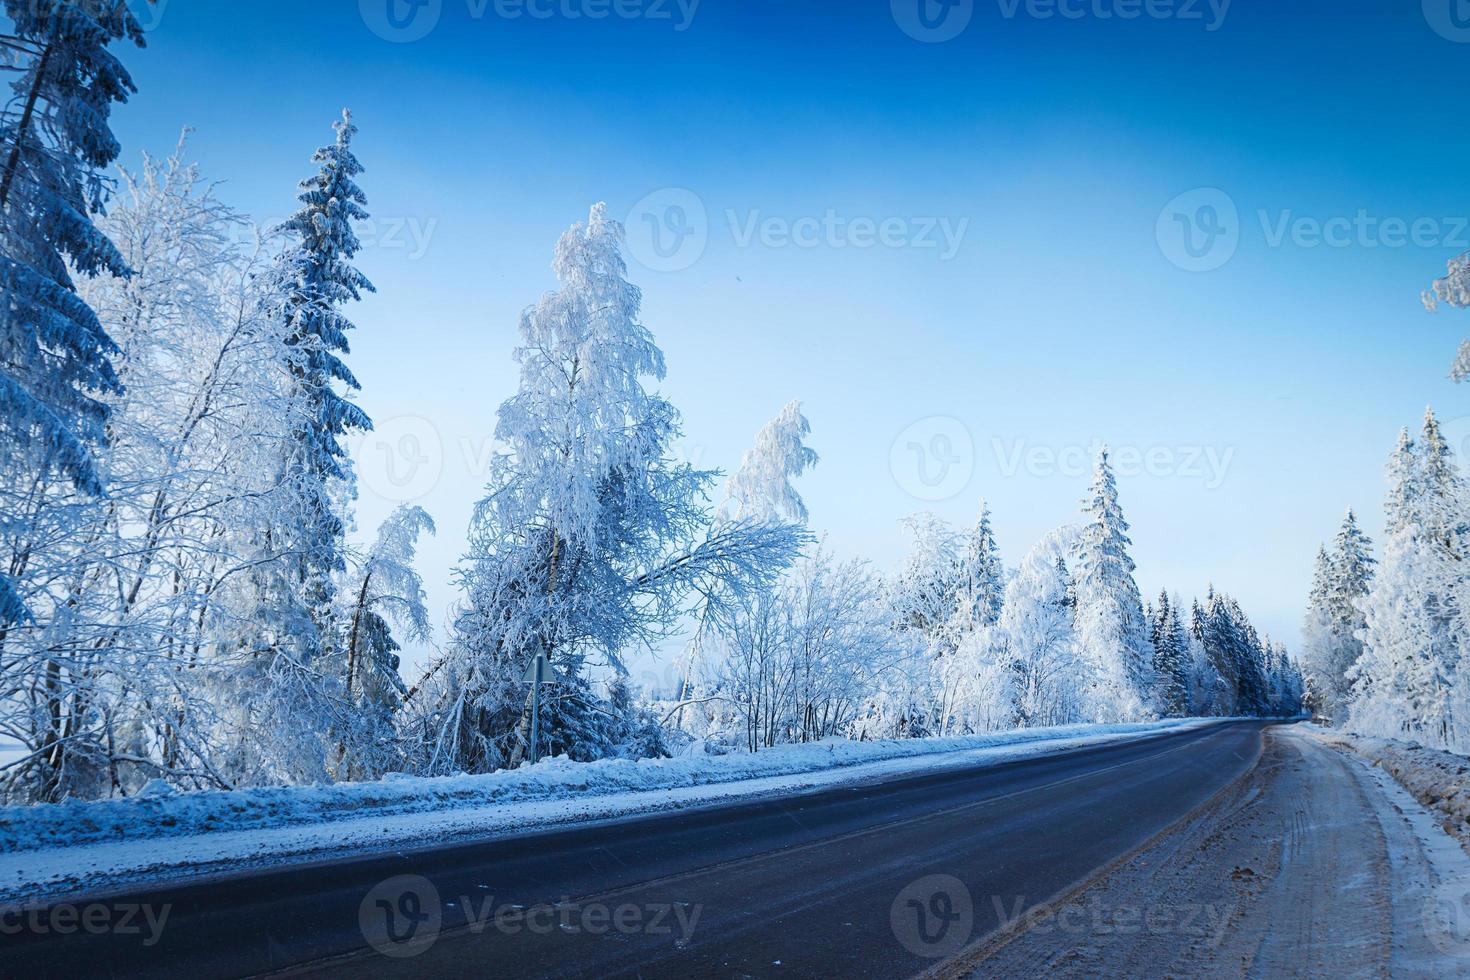 rysk vinterskog i snö foto